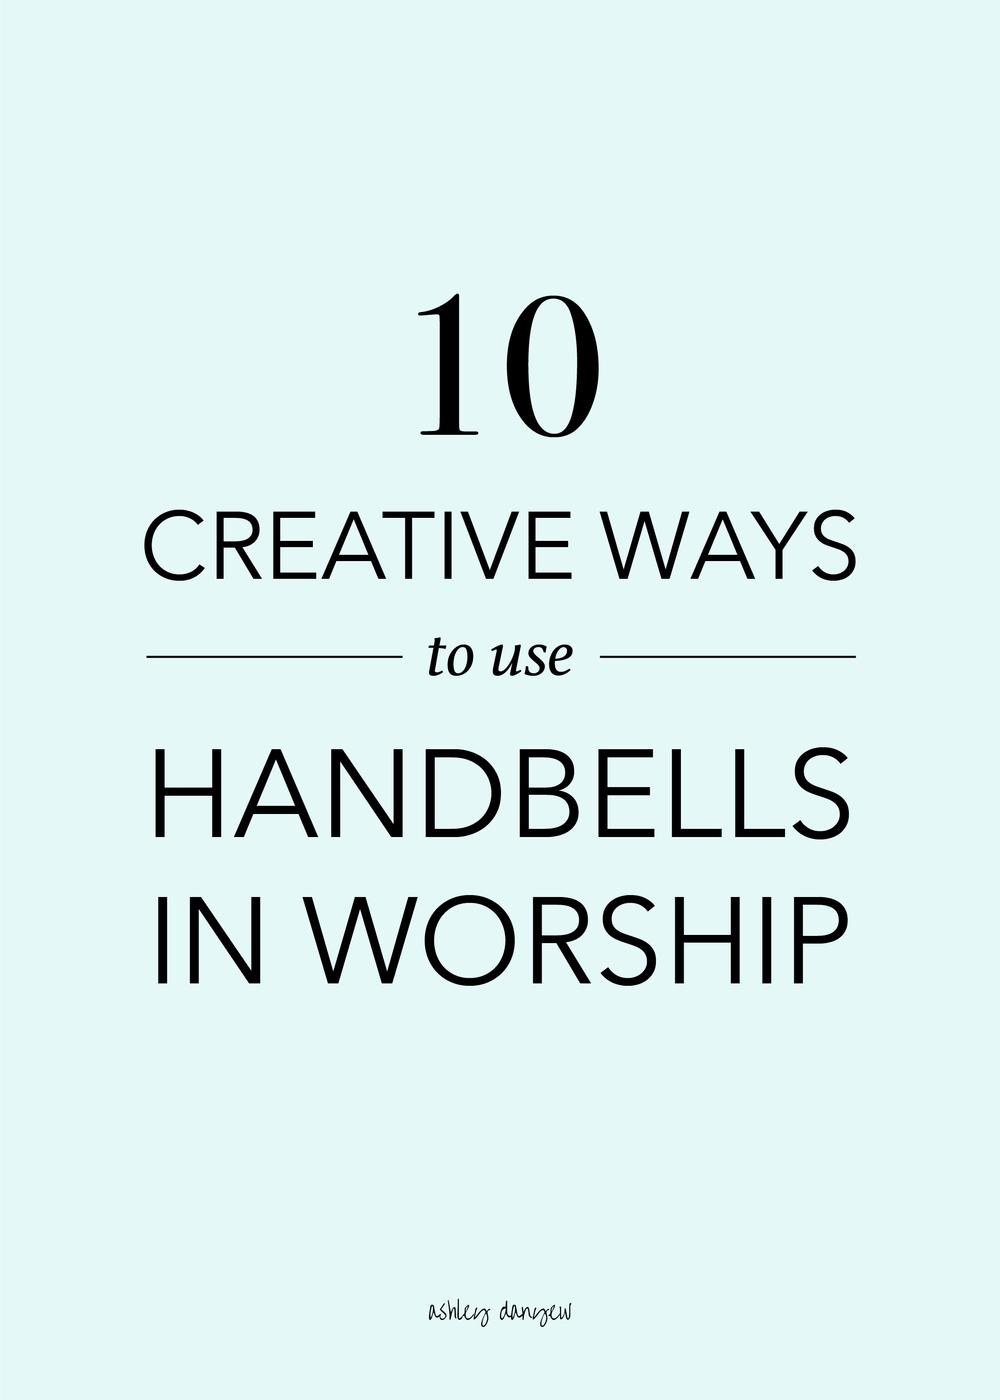 Copy of 10 Creative Ways to Use Handbells in Worship